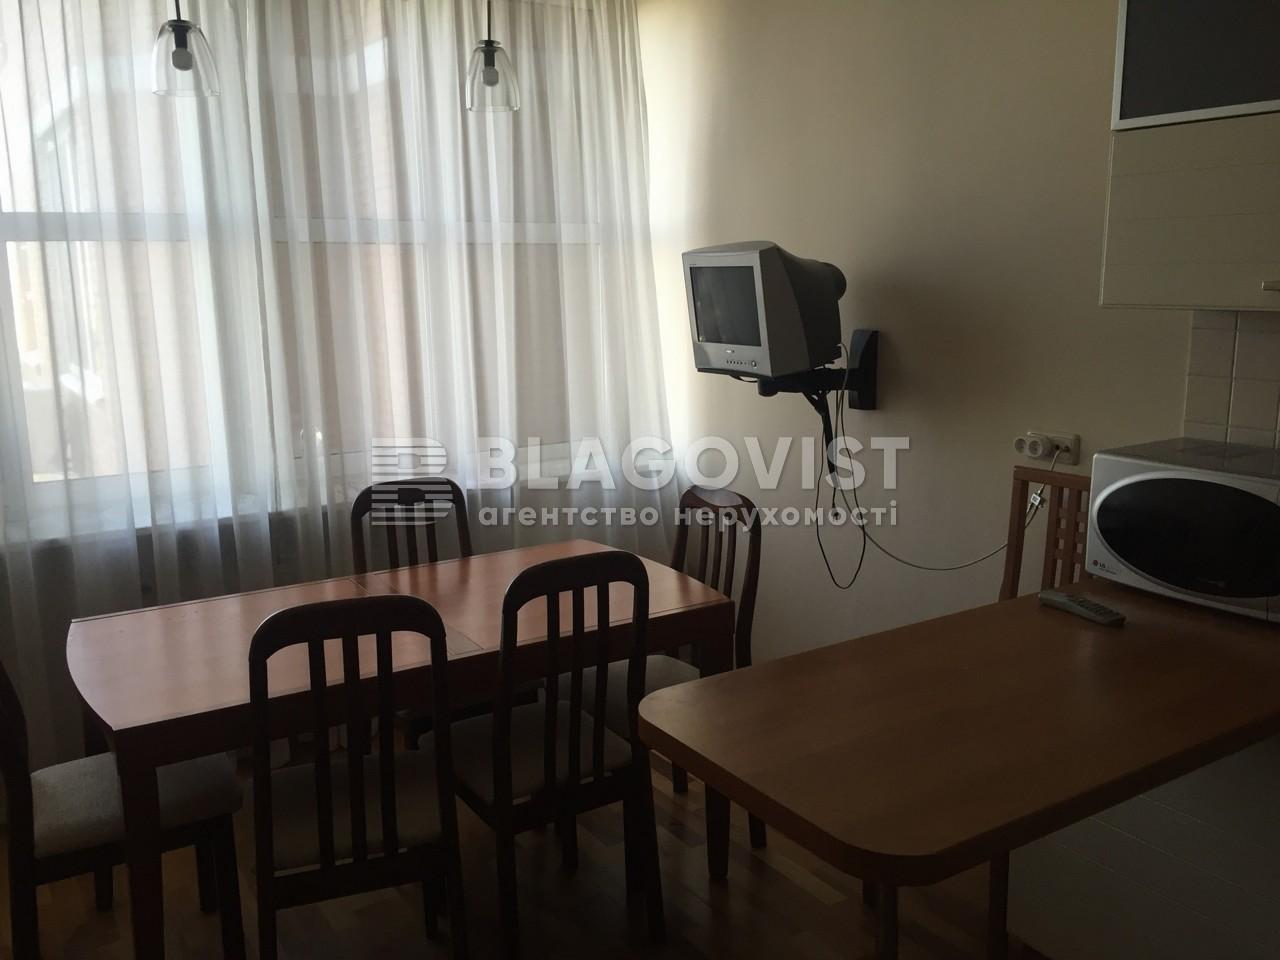 Квартира D-30452, Клиническая, 23/25, Киев - Фото 14